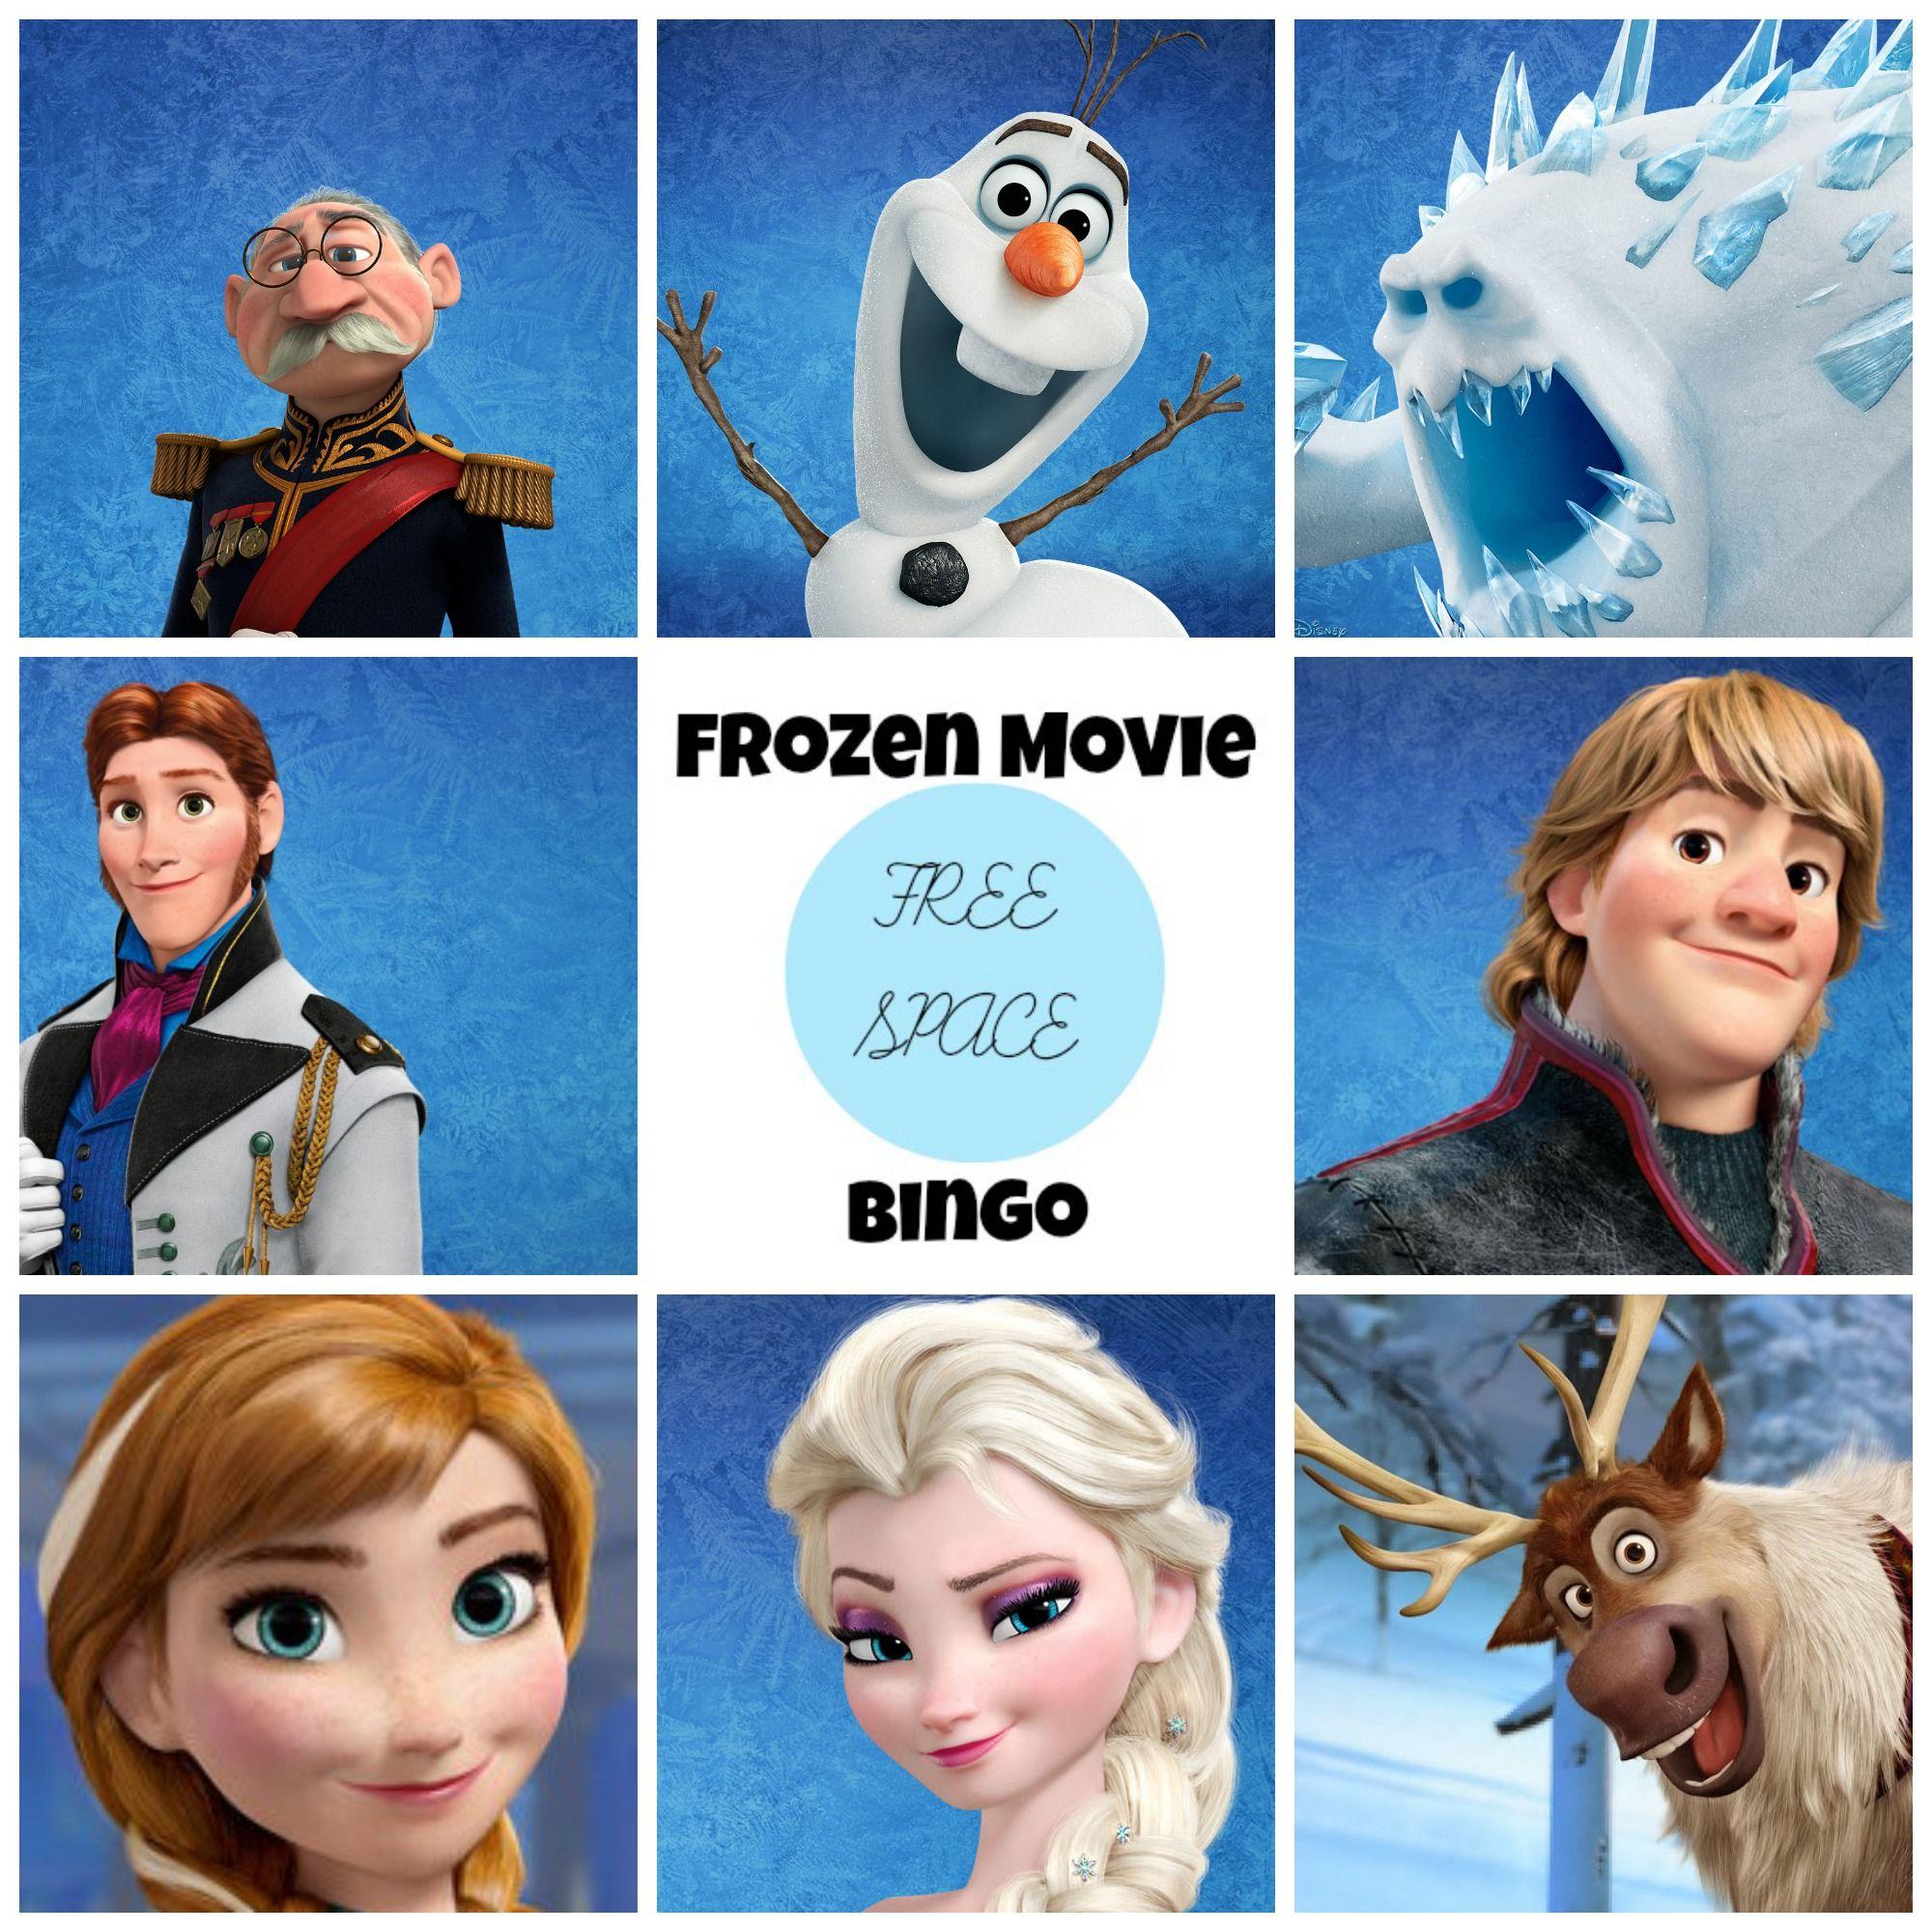 Frozen Dvd Free Frozen Movie Bingo Game Printable | Disney